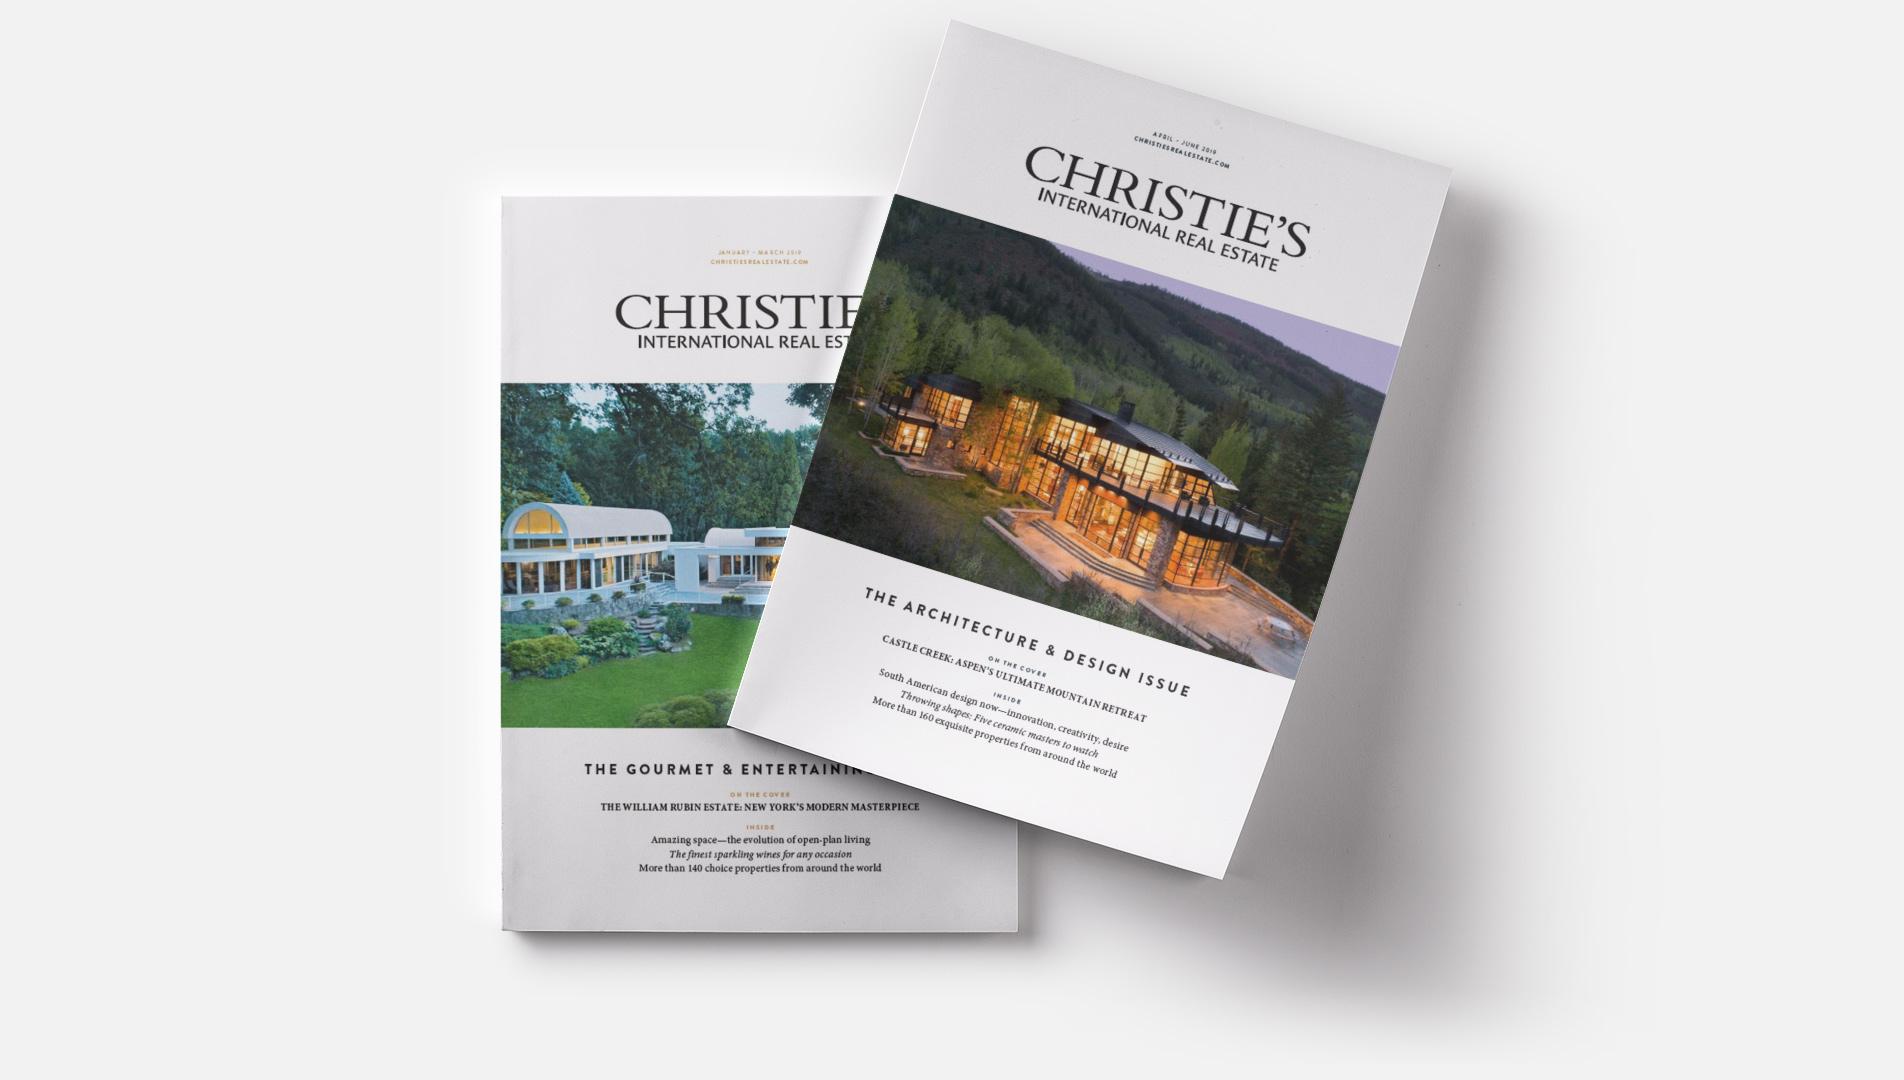 Christie's International Real Estate Magazines